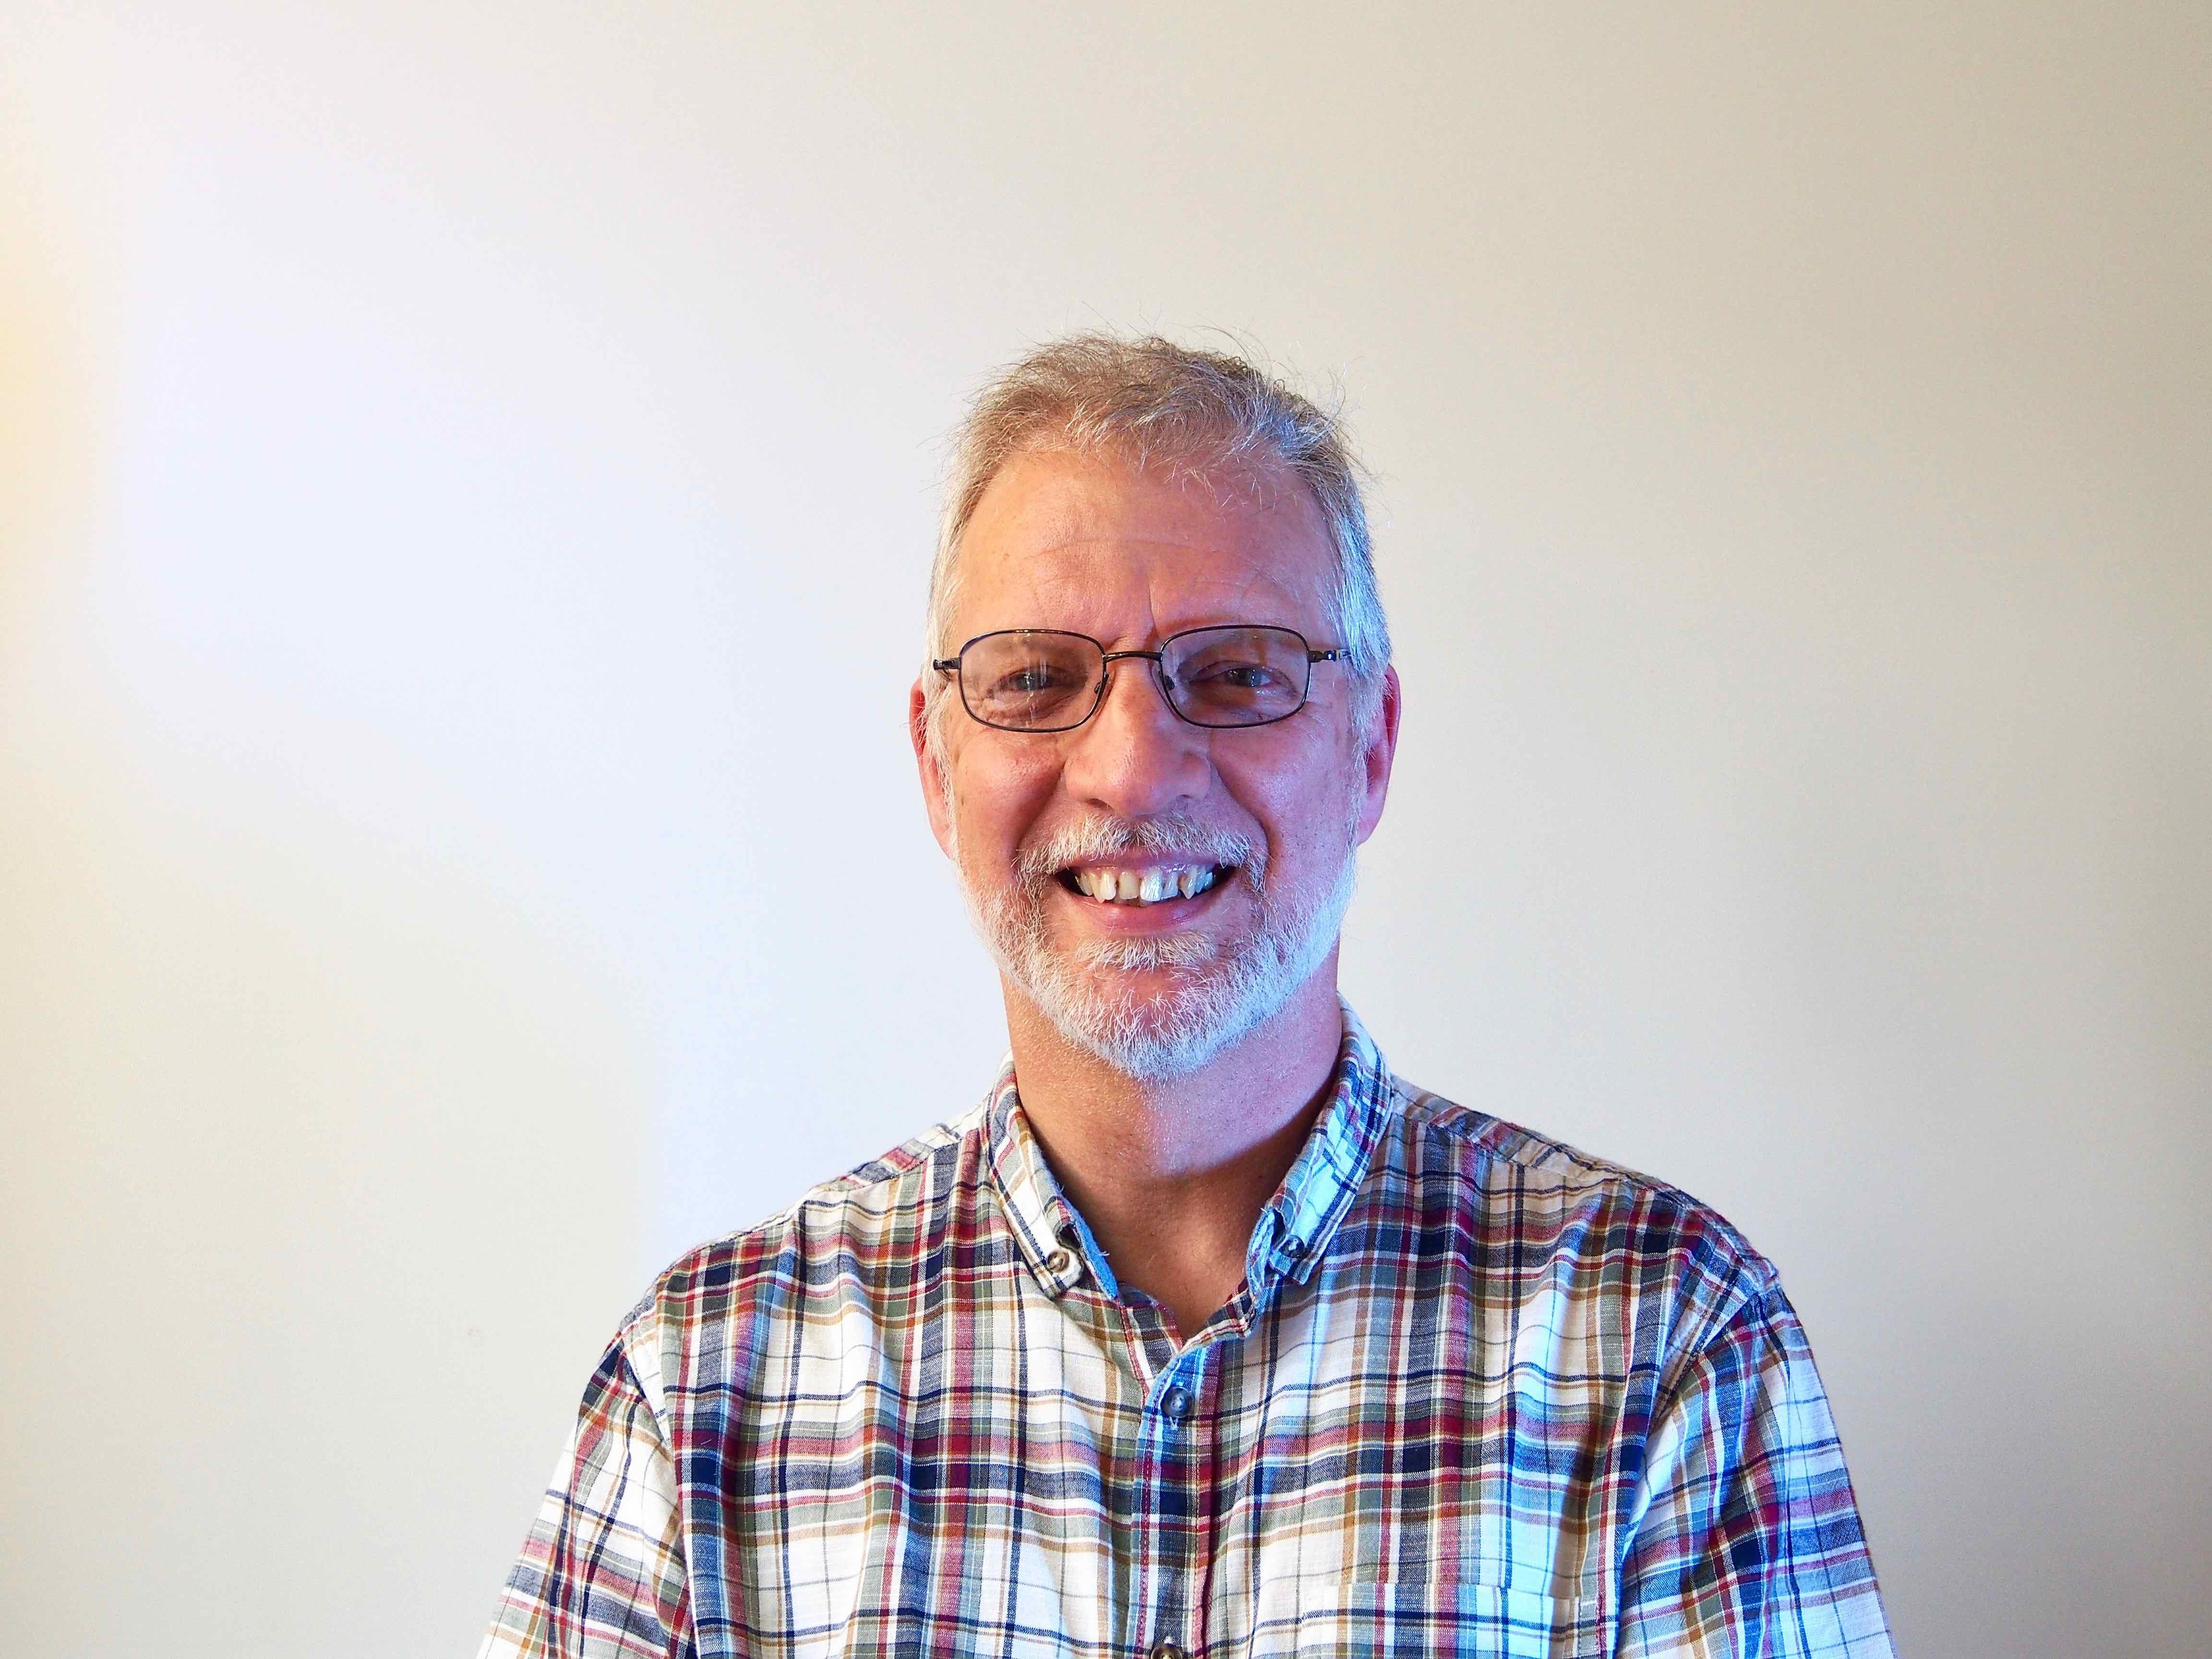 Photograph of Jon Morse